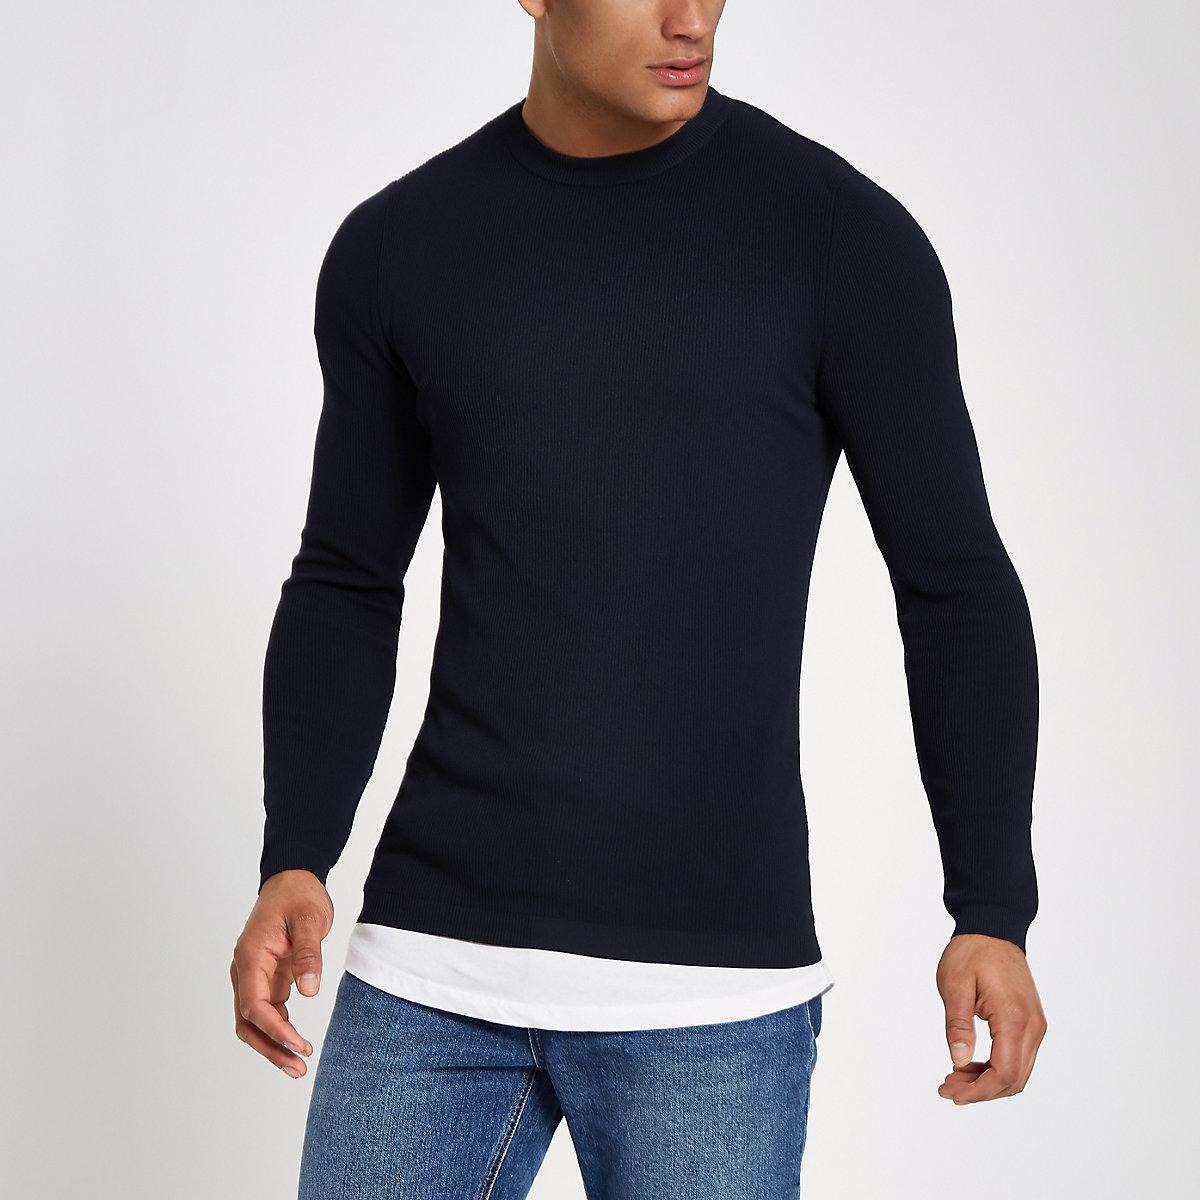 RI Studio navy crew neck muscle fit sweater